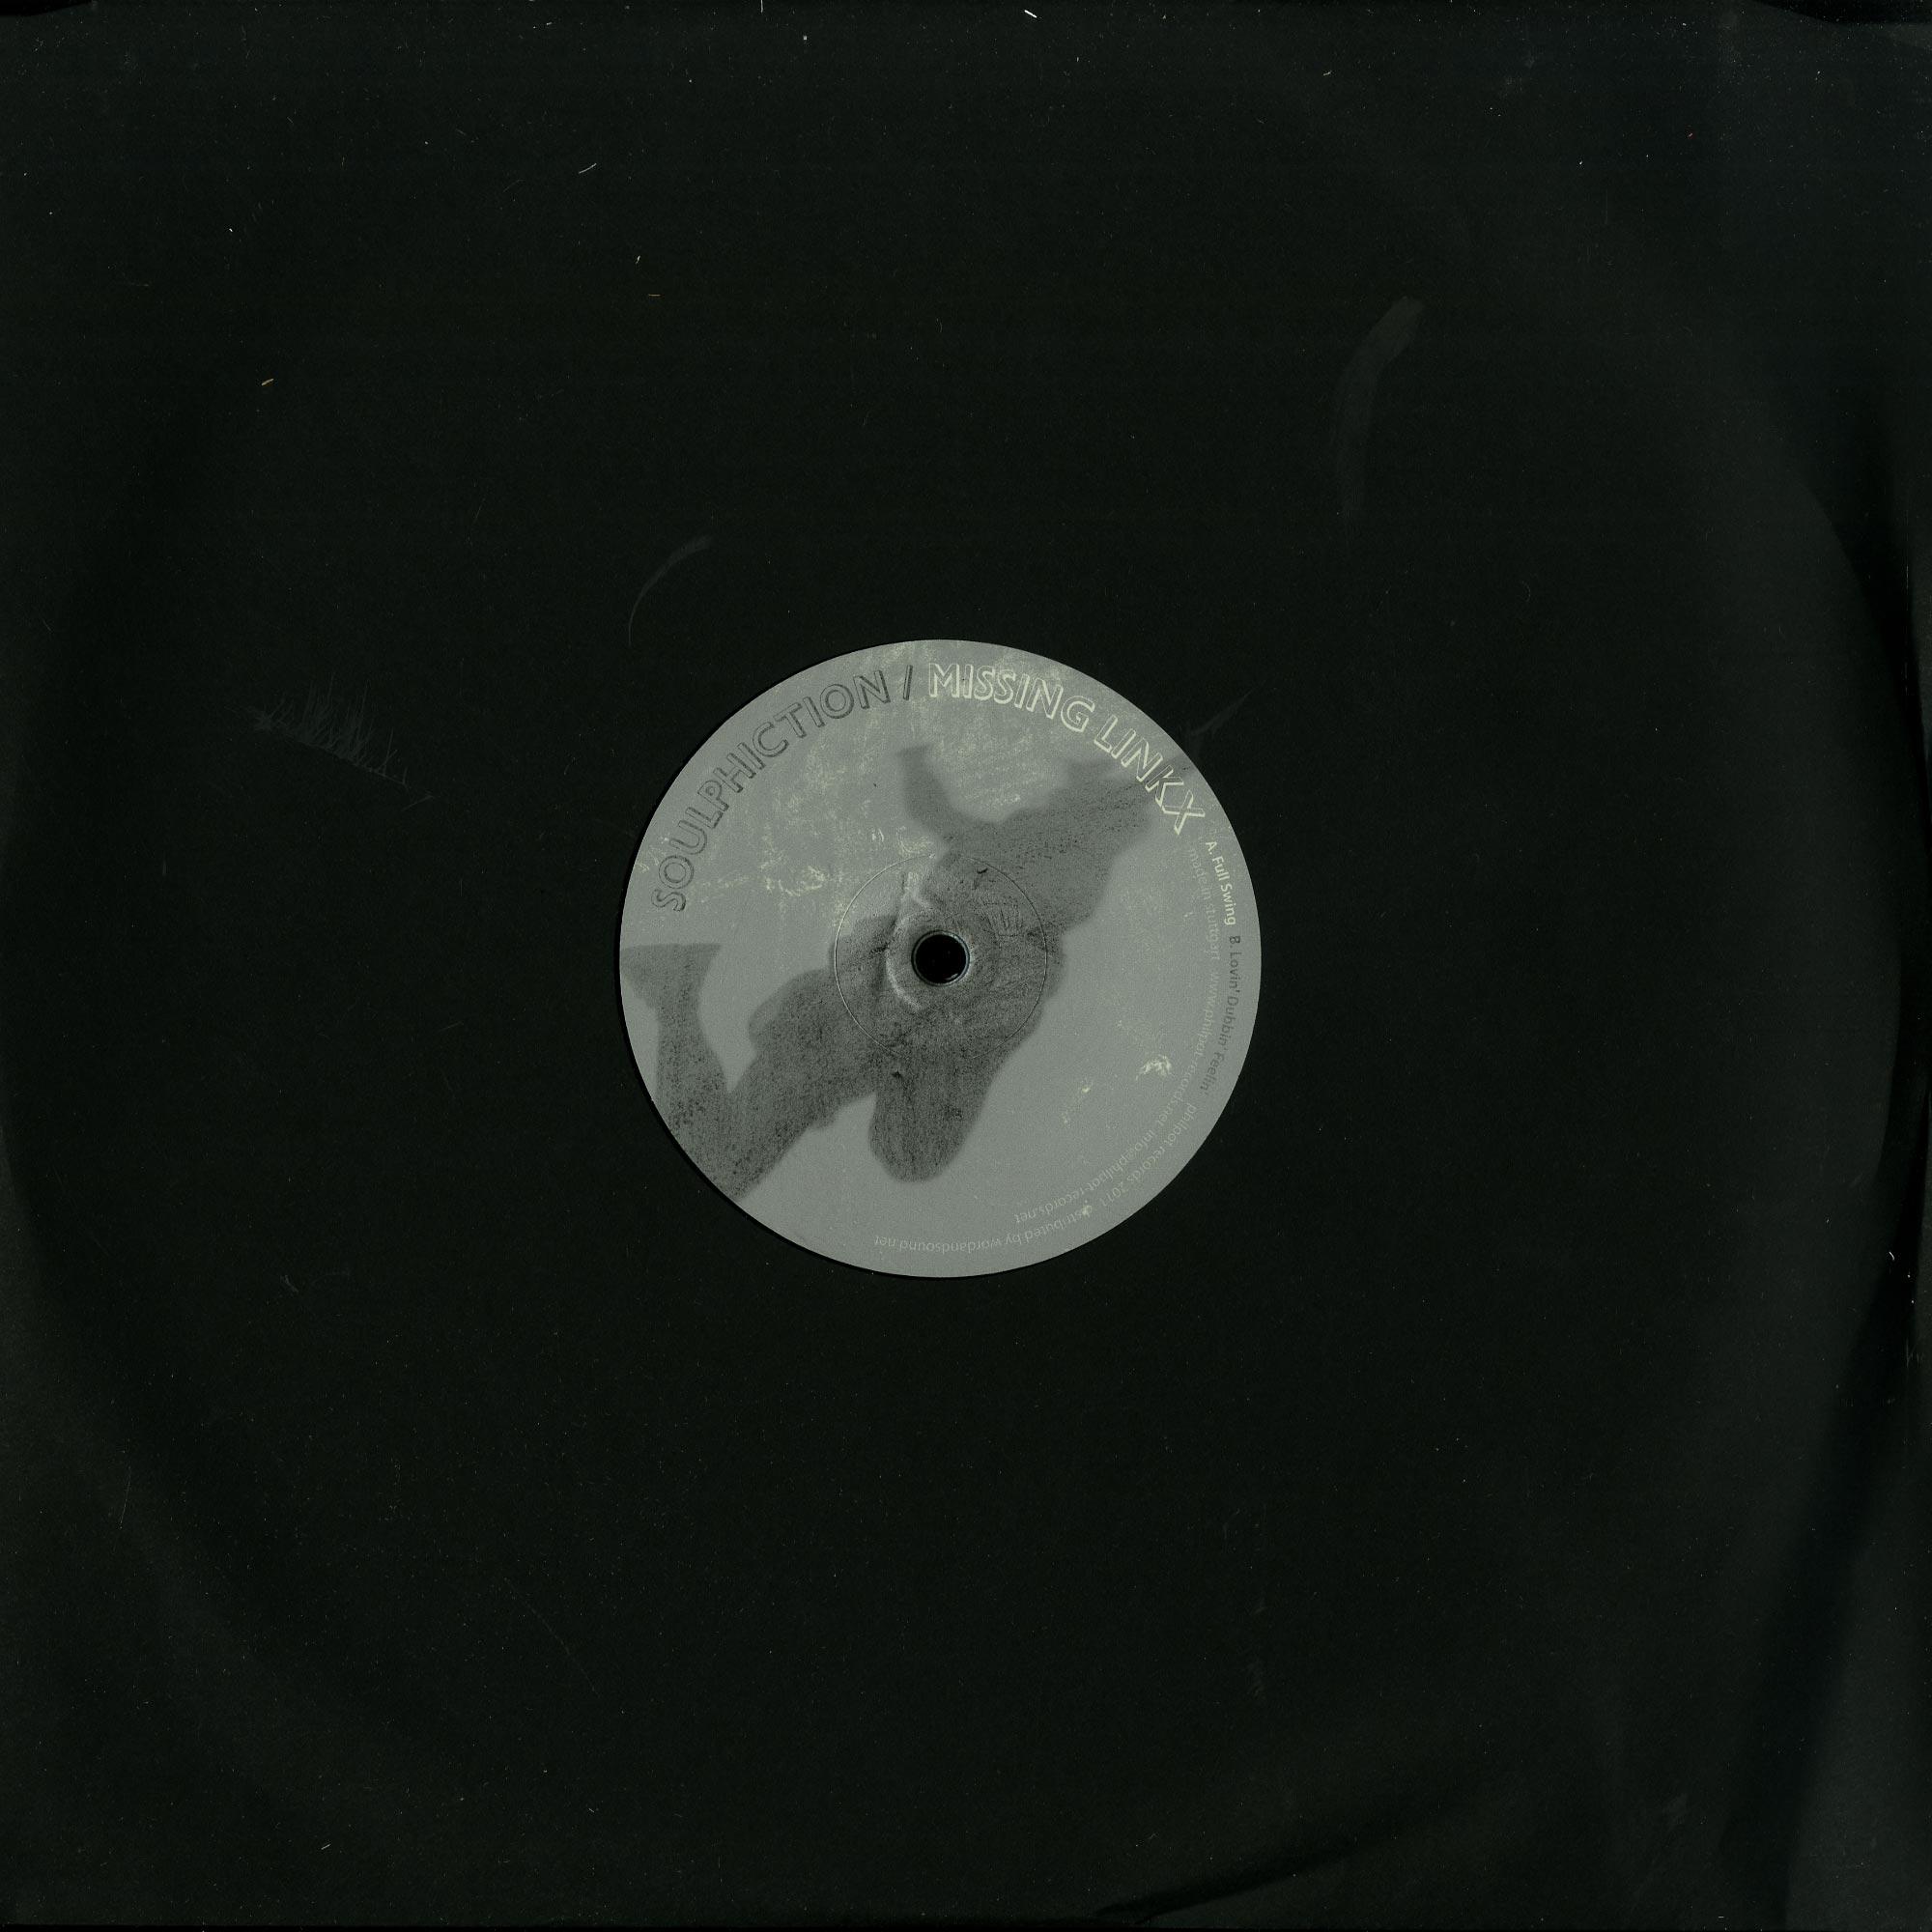 Soulphiction / Missing Linkx - FULL SWING